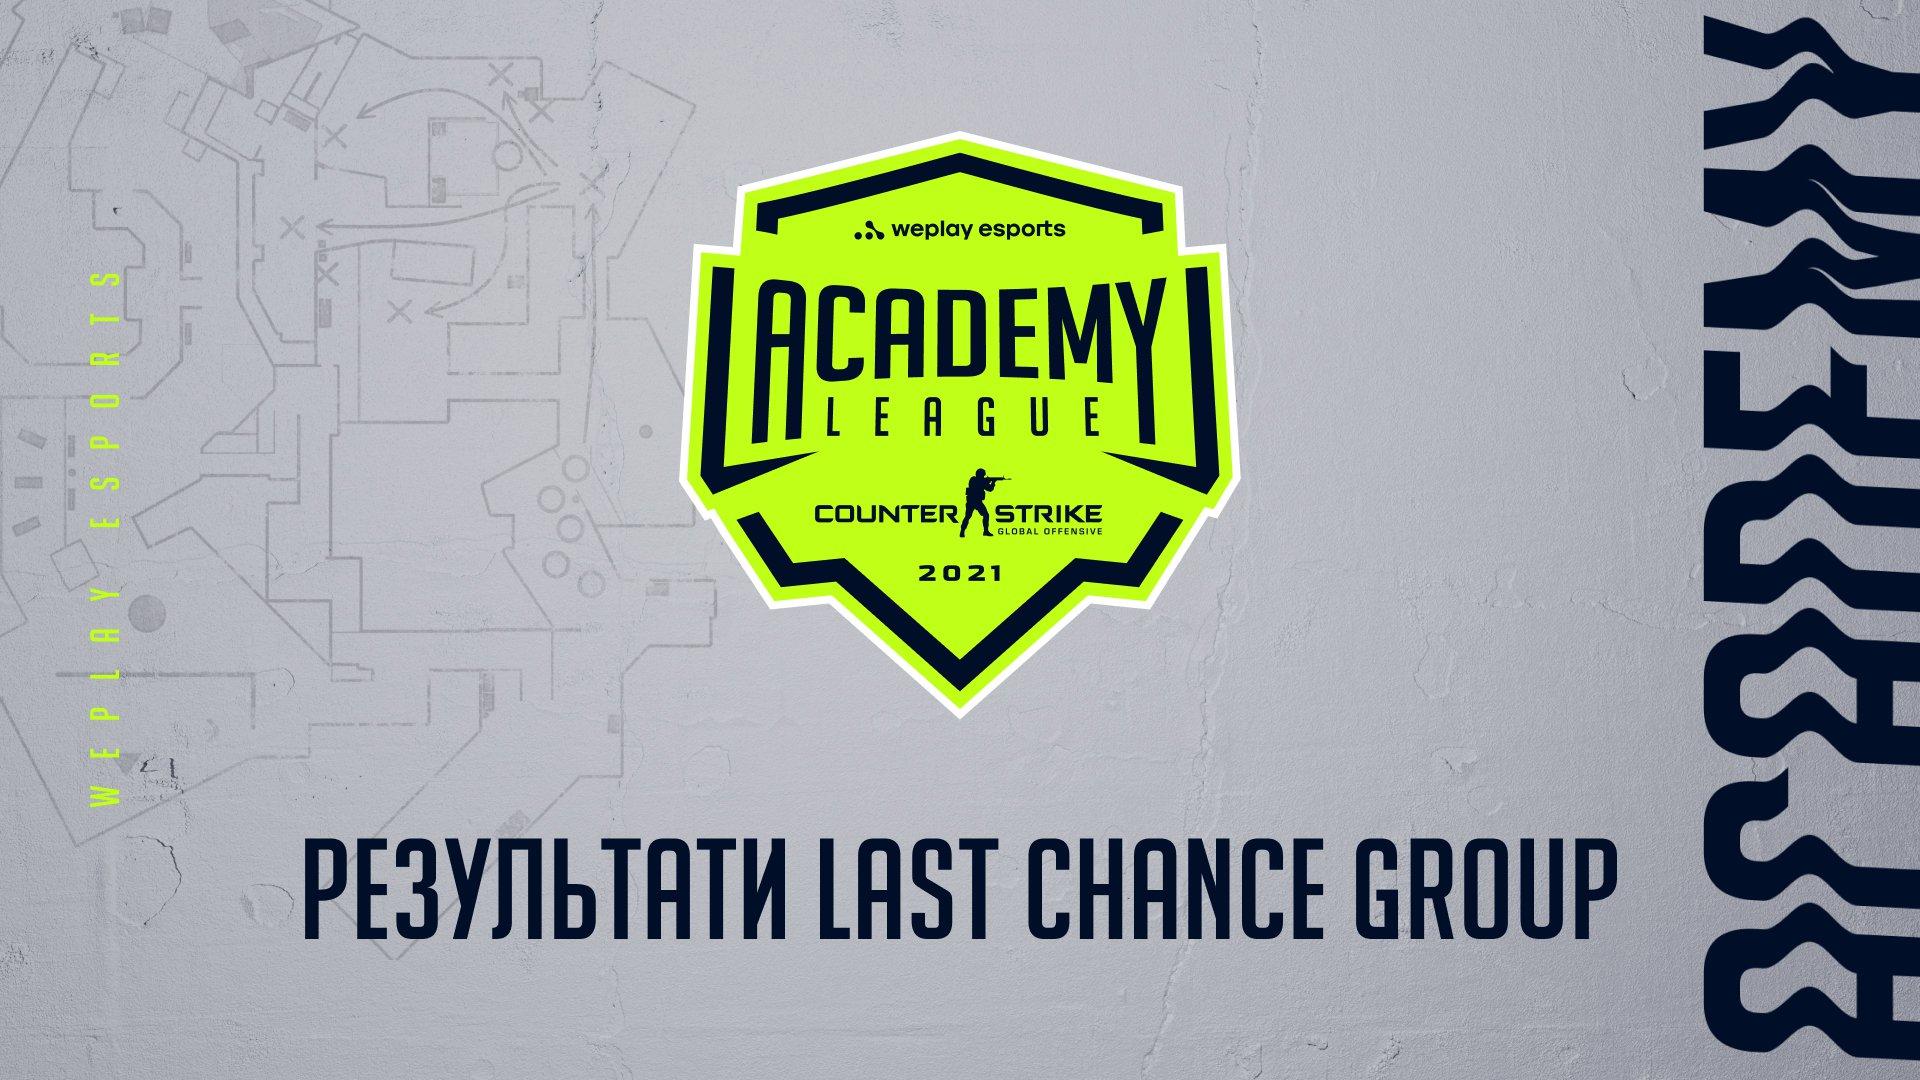 Результати етапу Last Chance Group другого сезону WePlay Academy League. Зображення: WePlay Holding